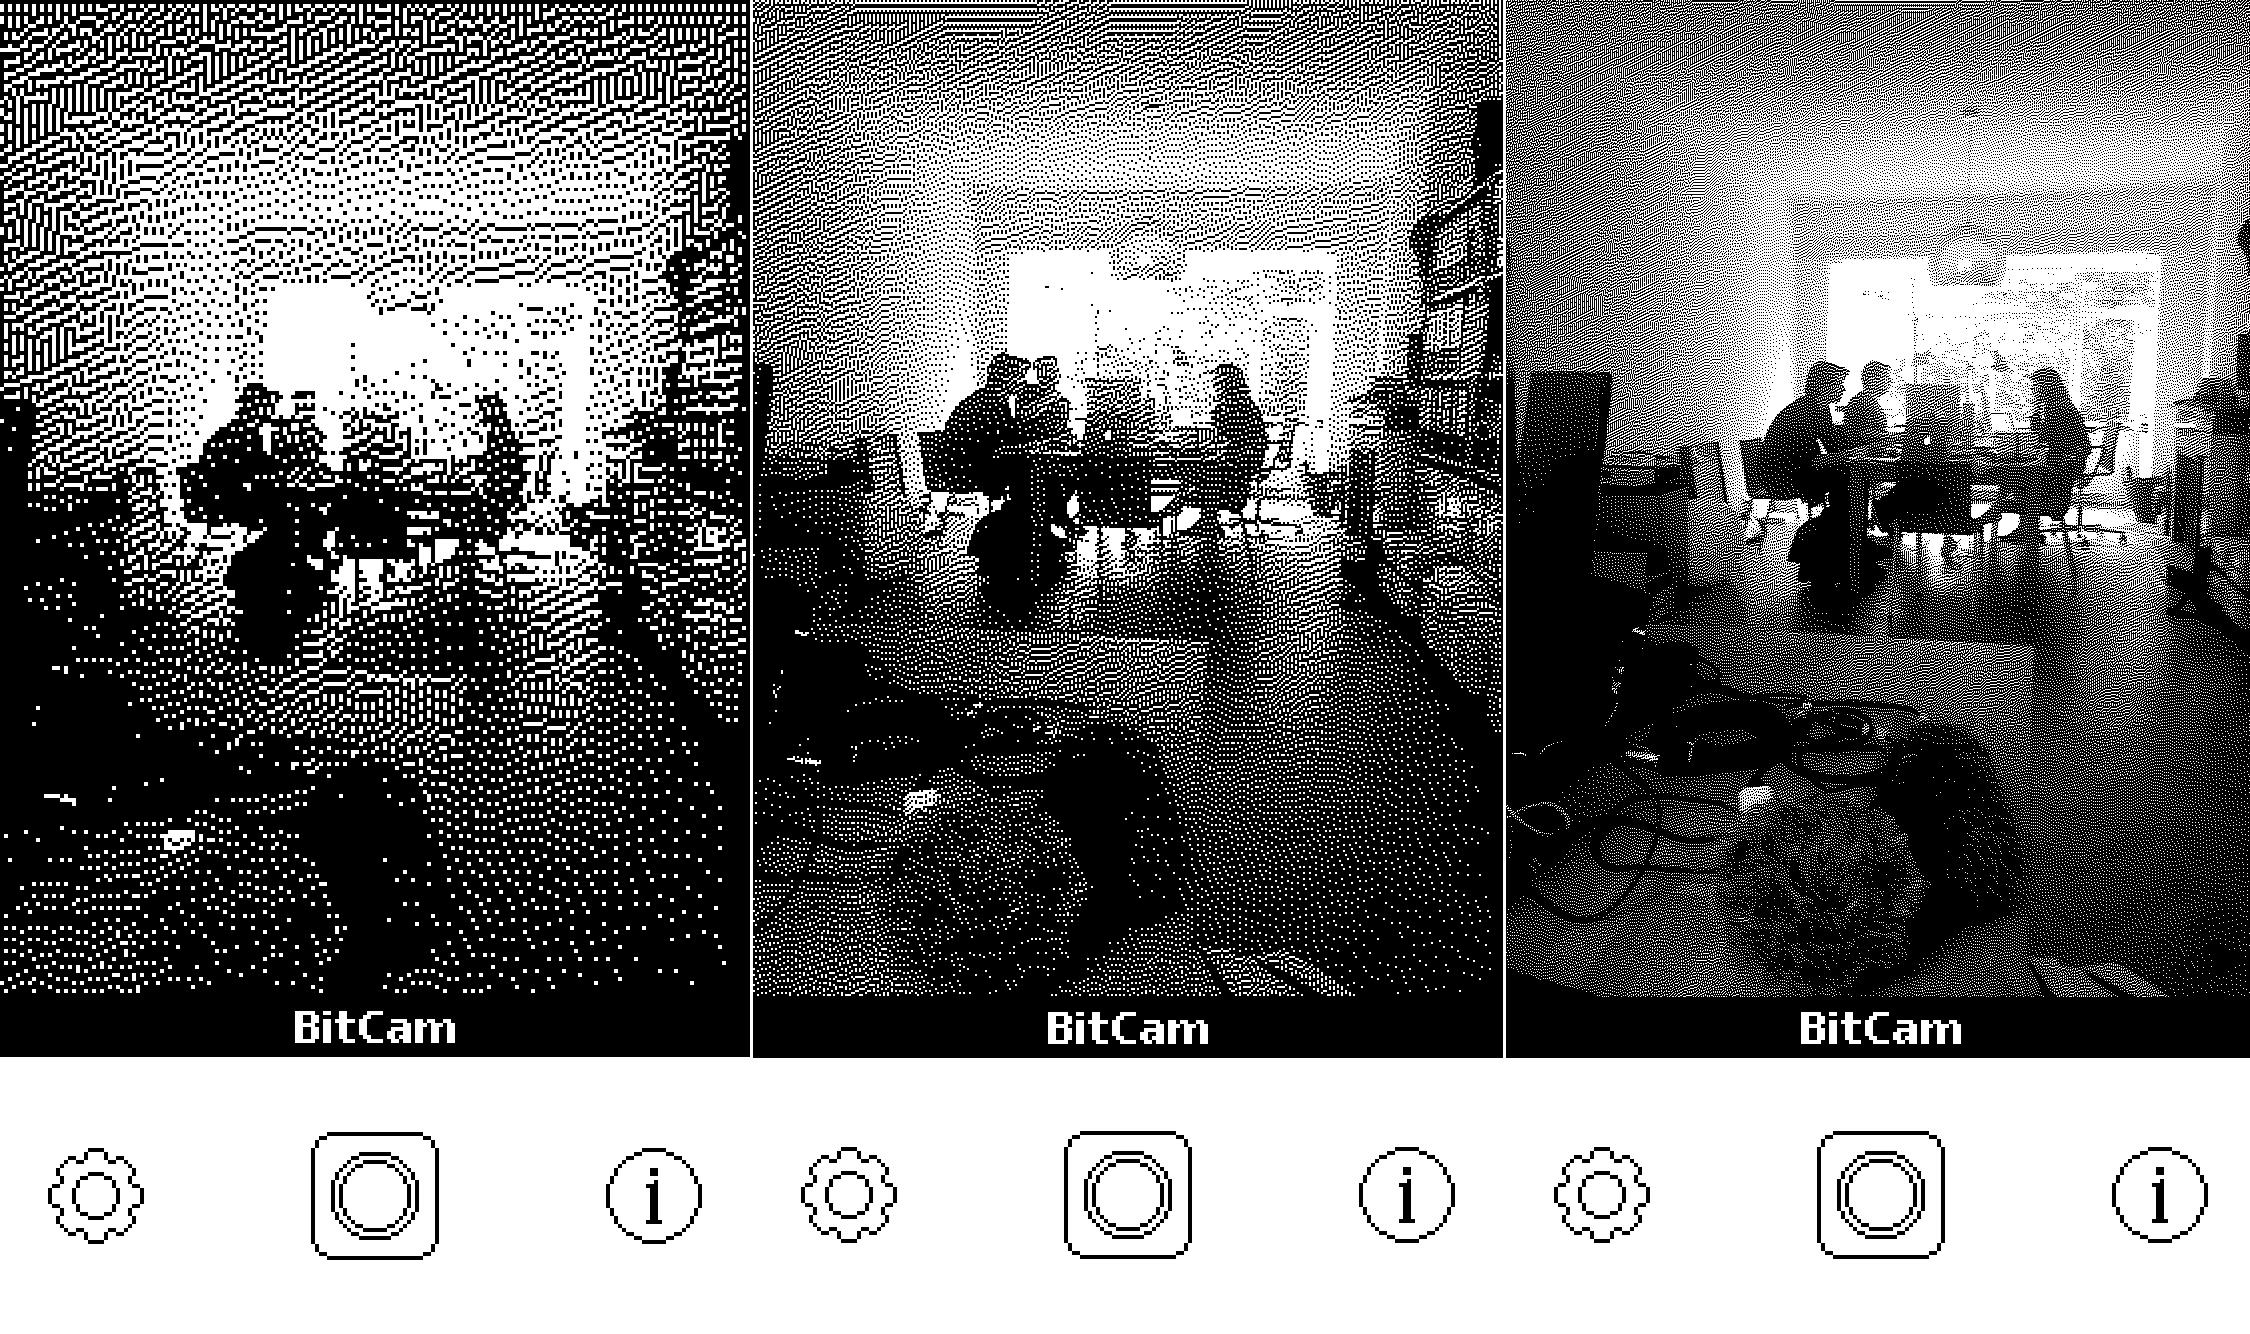 bitcam-002